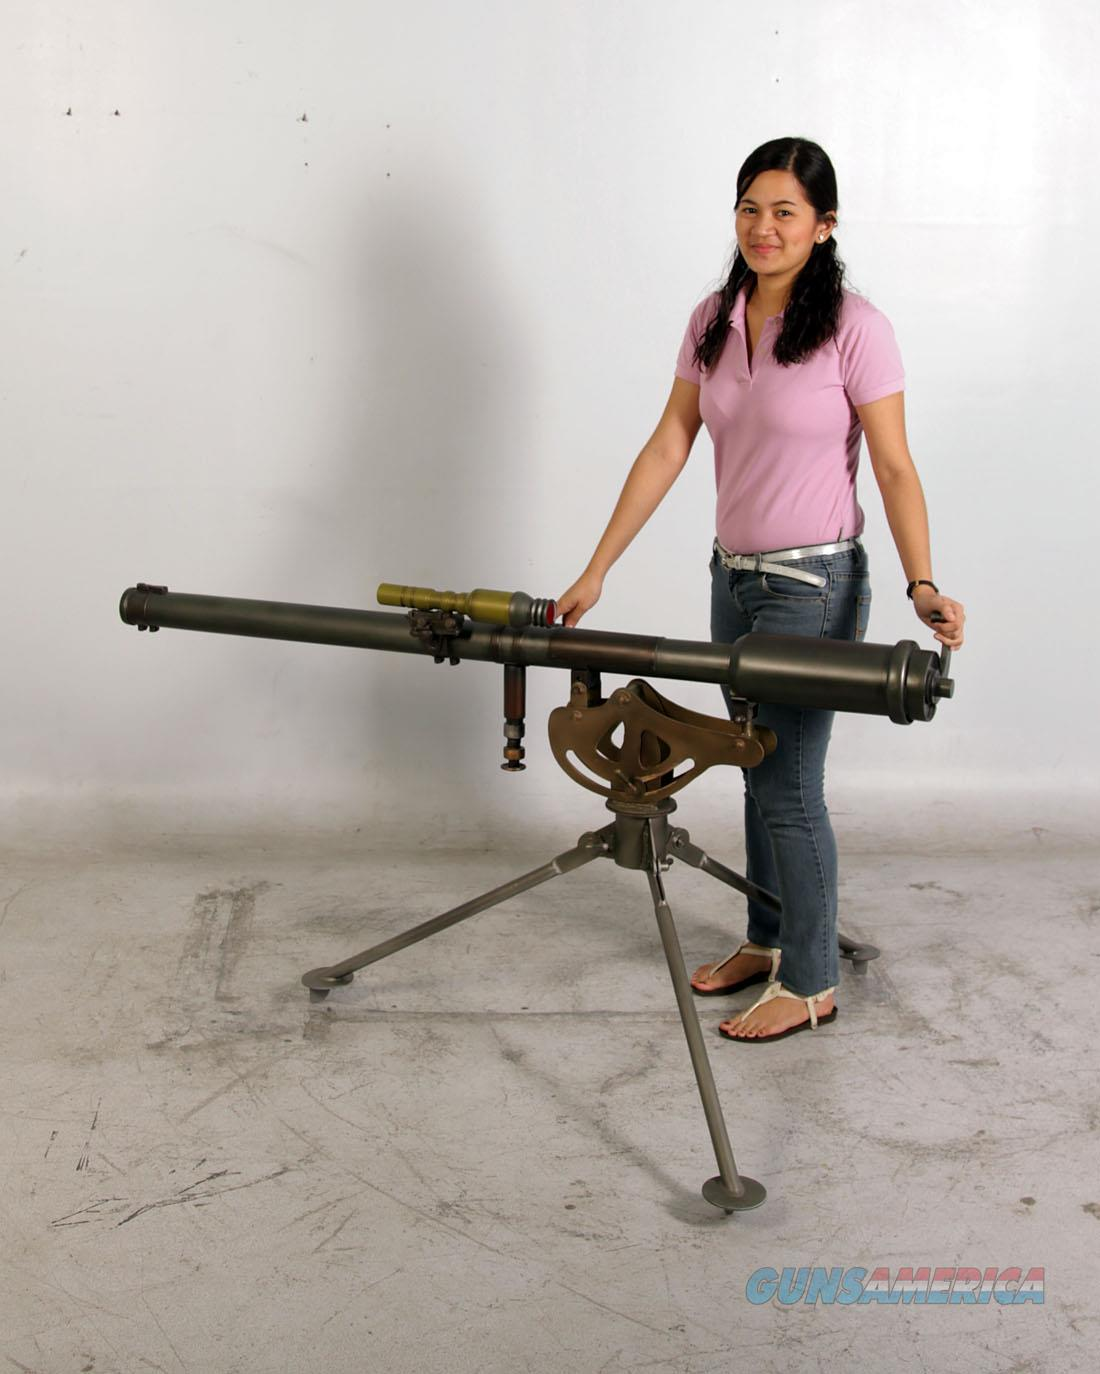 M18 RECOILLESS REPLICA  RIFLE WITH TRIPOD  Guns > Rifles > Military Misc. Rifles US > Drill Rifles